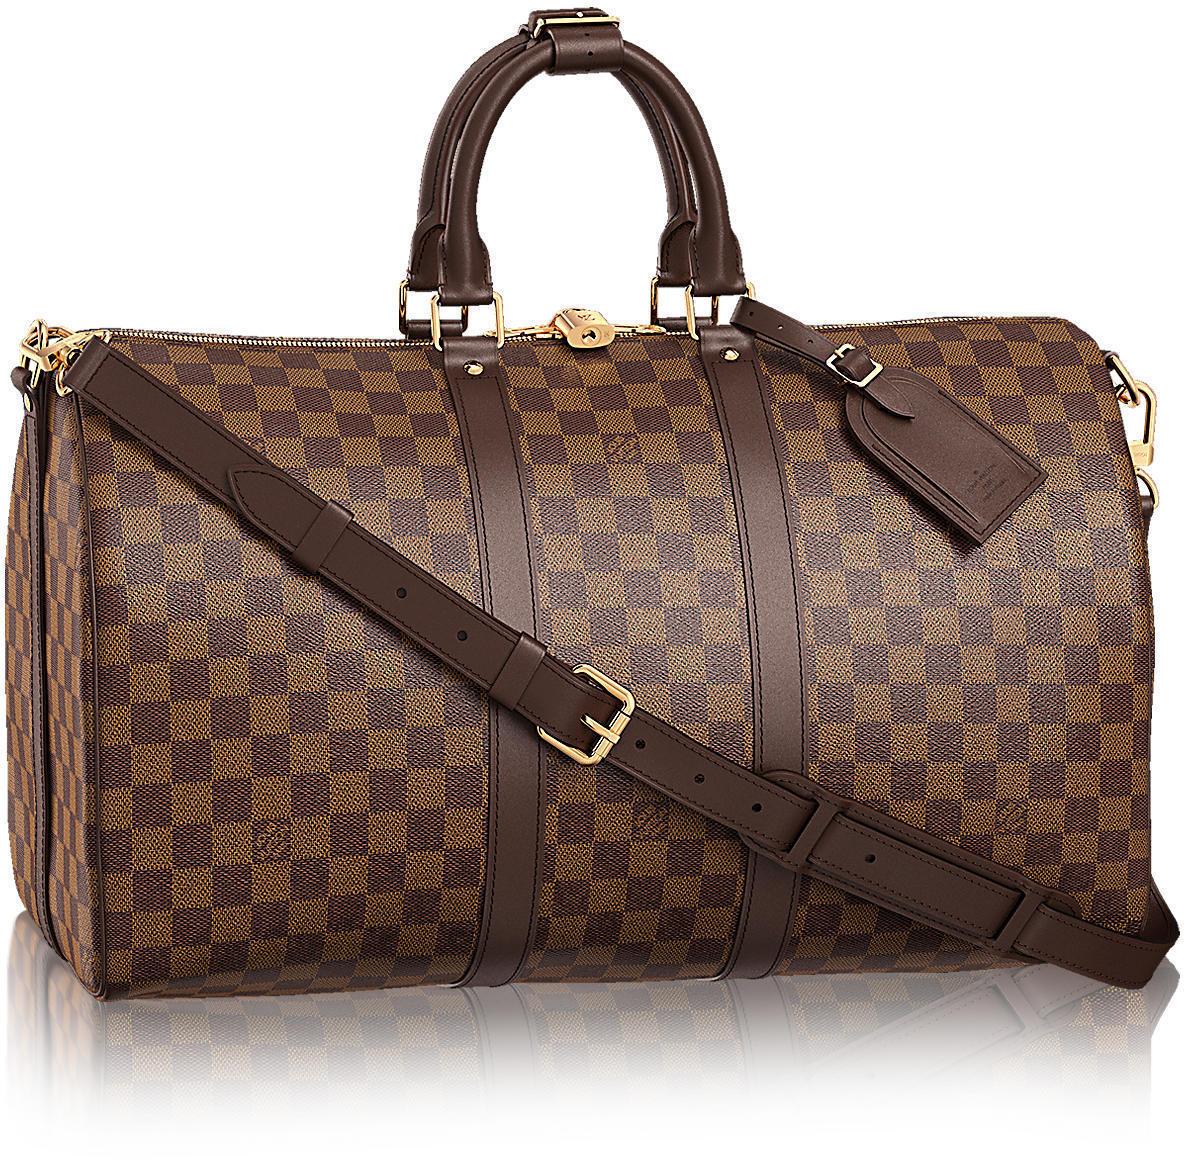 Louis Vuitton Keepall Bandouliere Damier Ebene 45 Brown